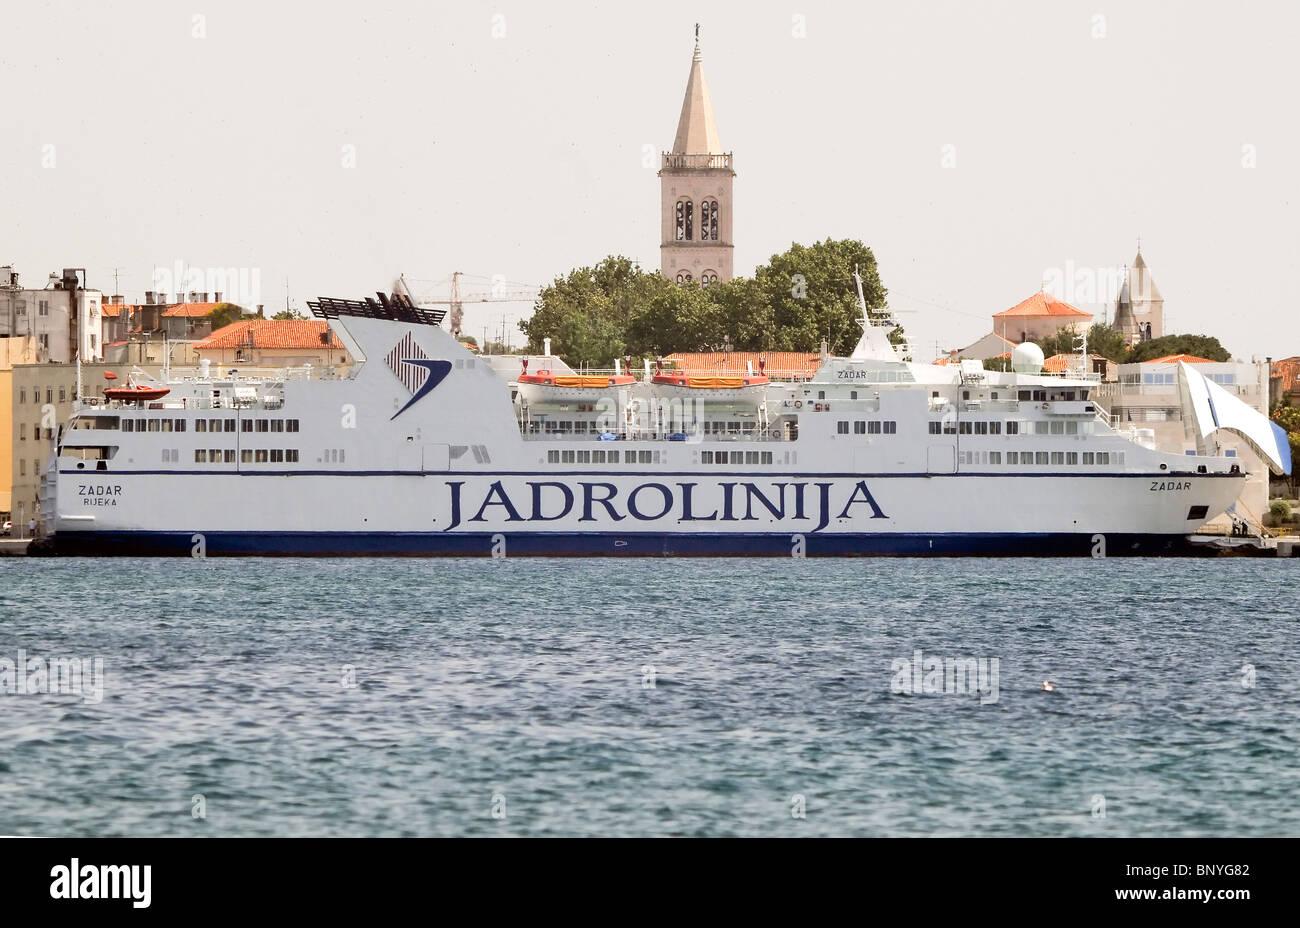 Jadrolinija Ferry at Zadar, Croatia - Stock Image